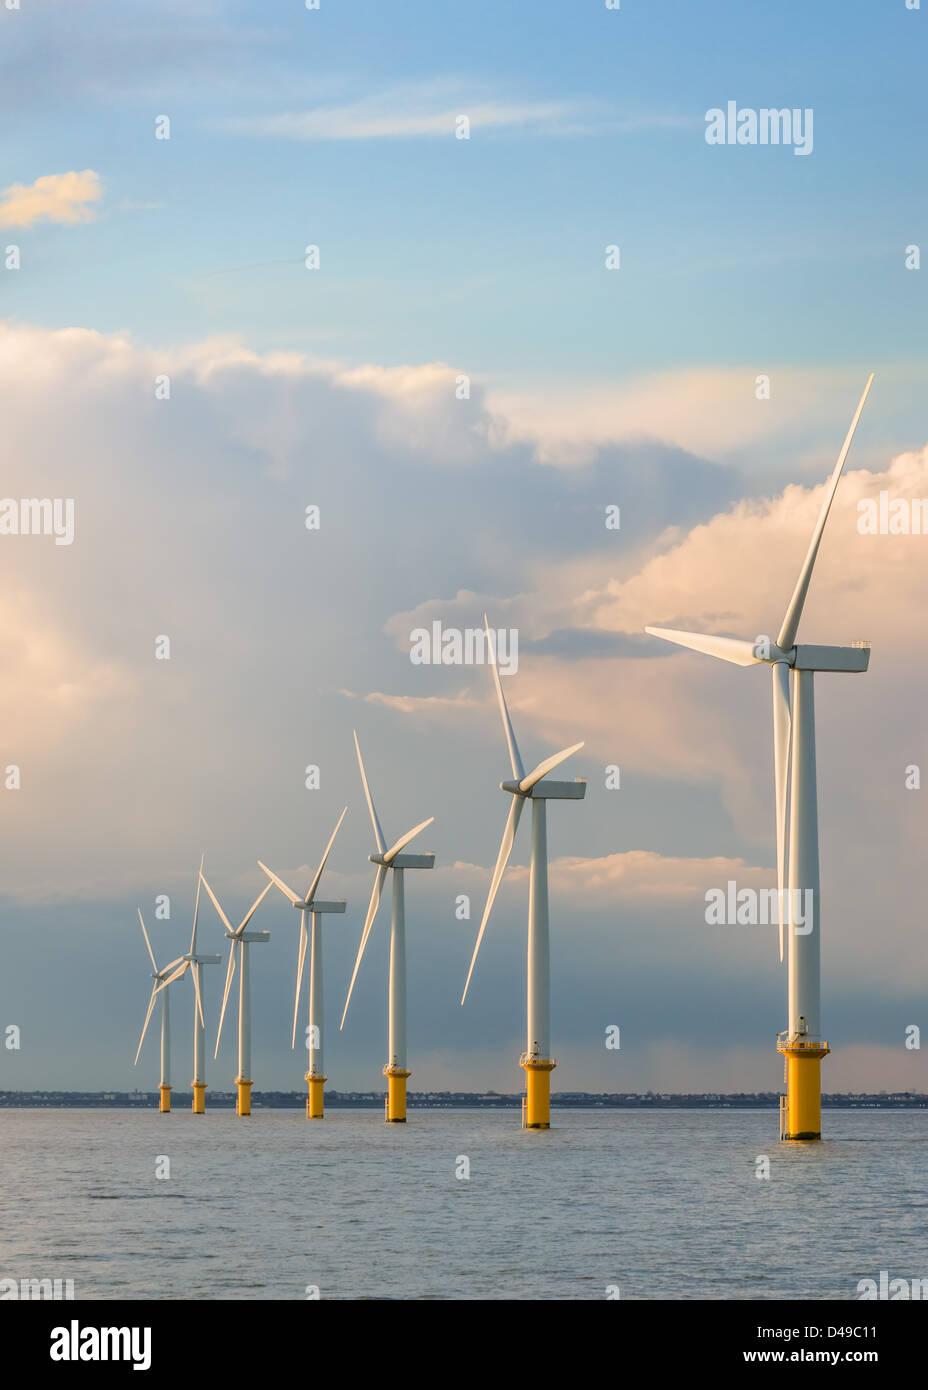 Generatoren-Windpark auf dem Meer Stockbild